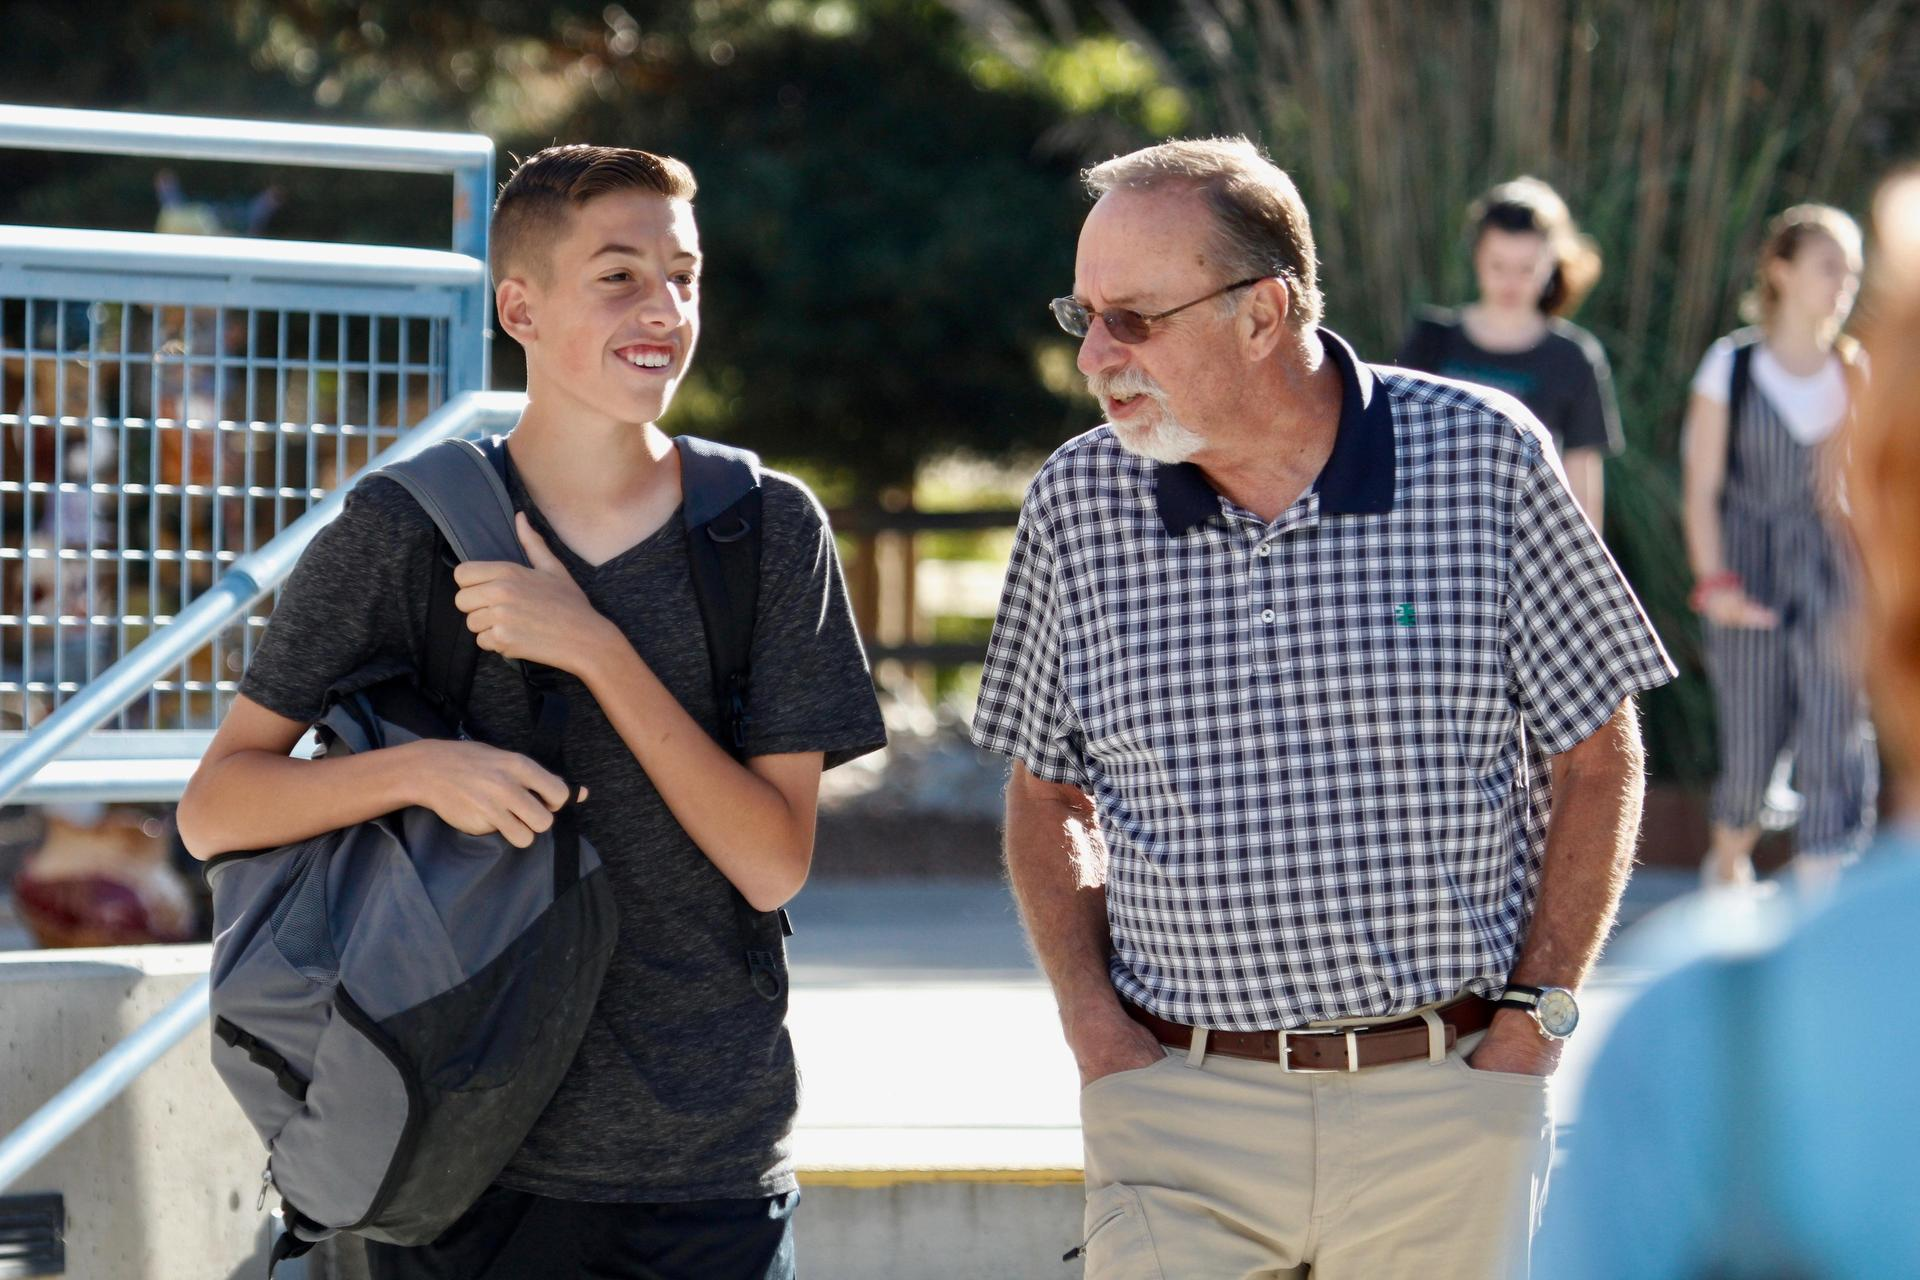 Student walks with grandparent